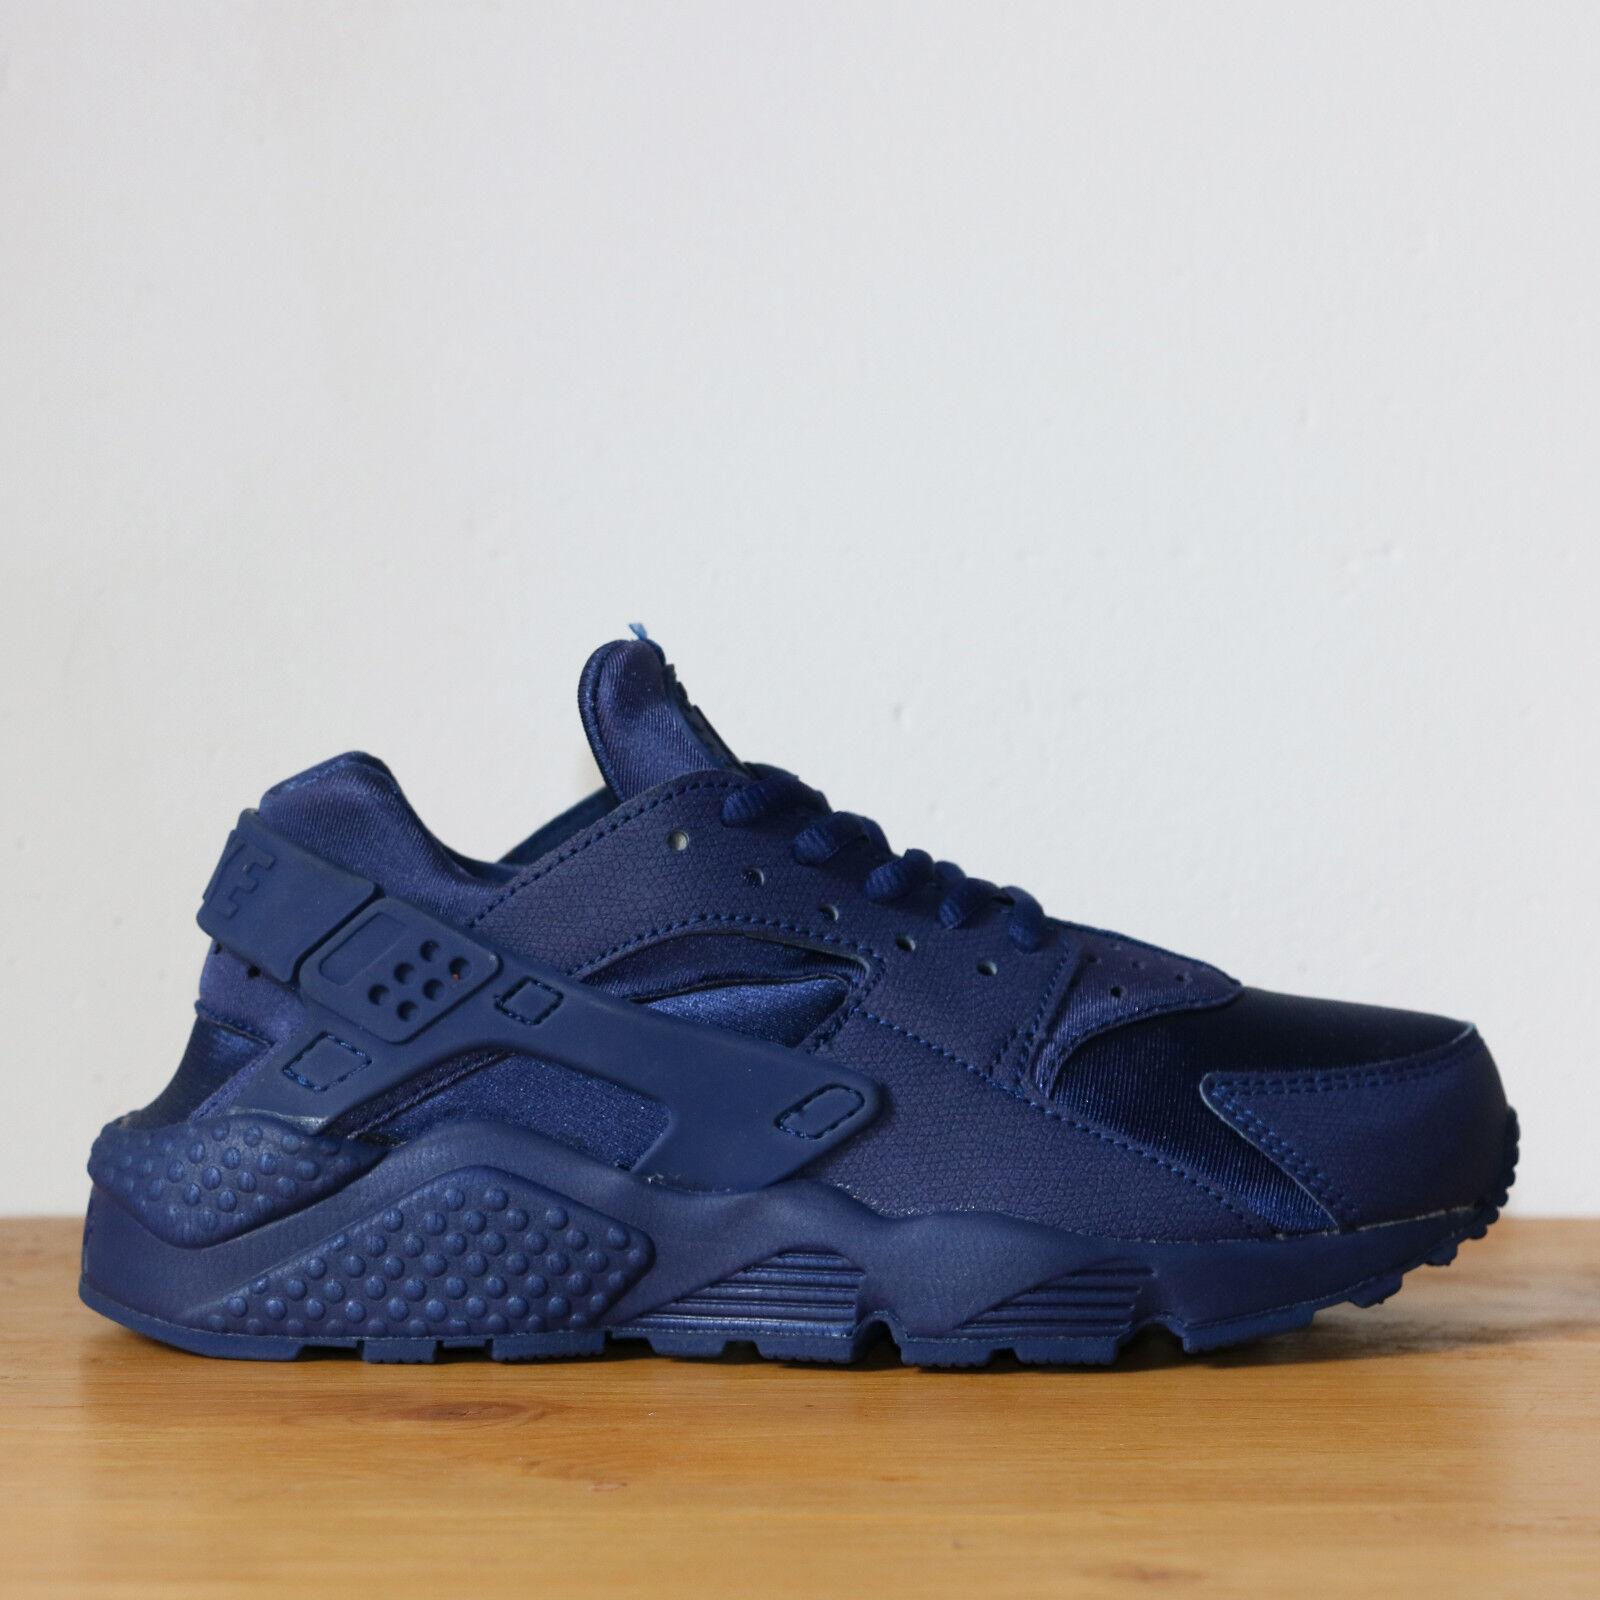 Nike Wmns Air Huarache Run 7us - 38eu Loyal bleu Bleu  baskets DS